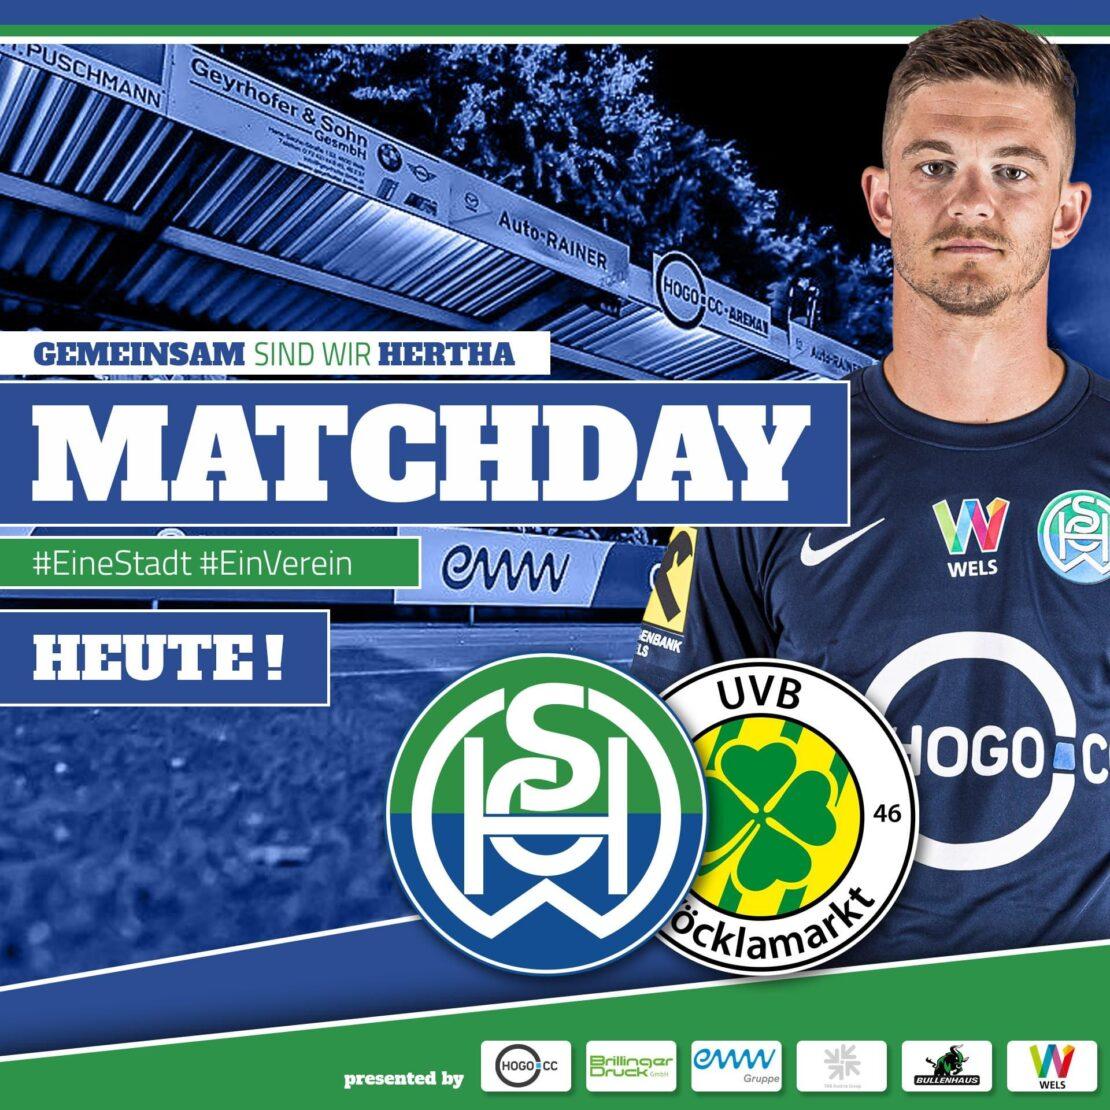 WSC Matchday